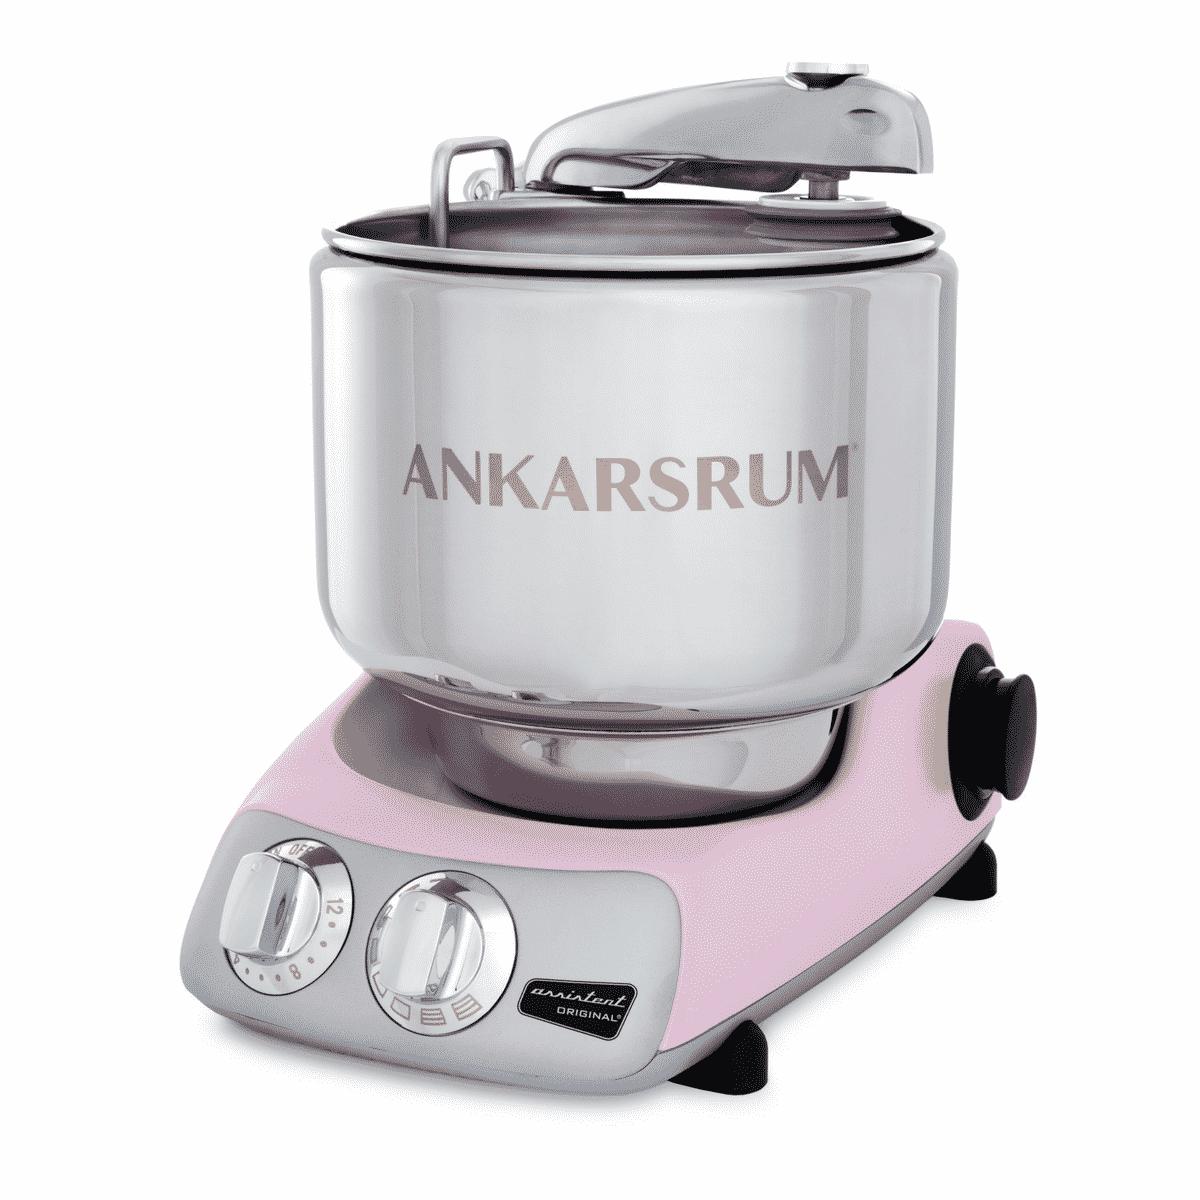 Ankarsrum Assistent Original AKM 6230 - Lyseroed